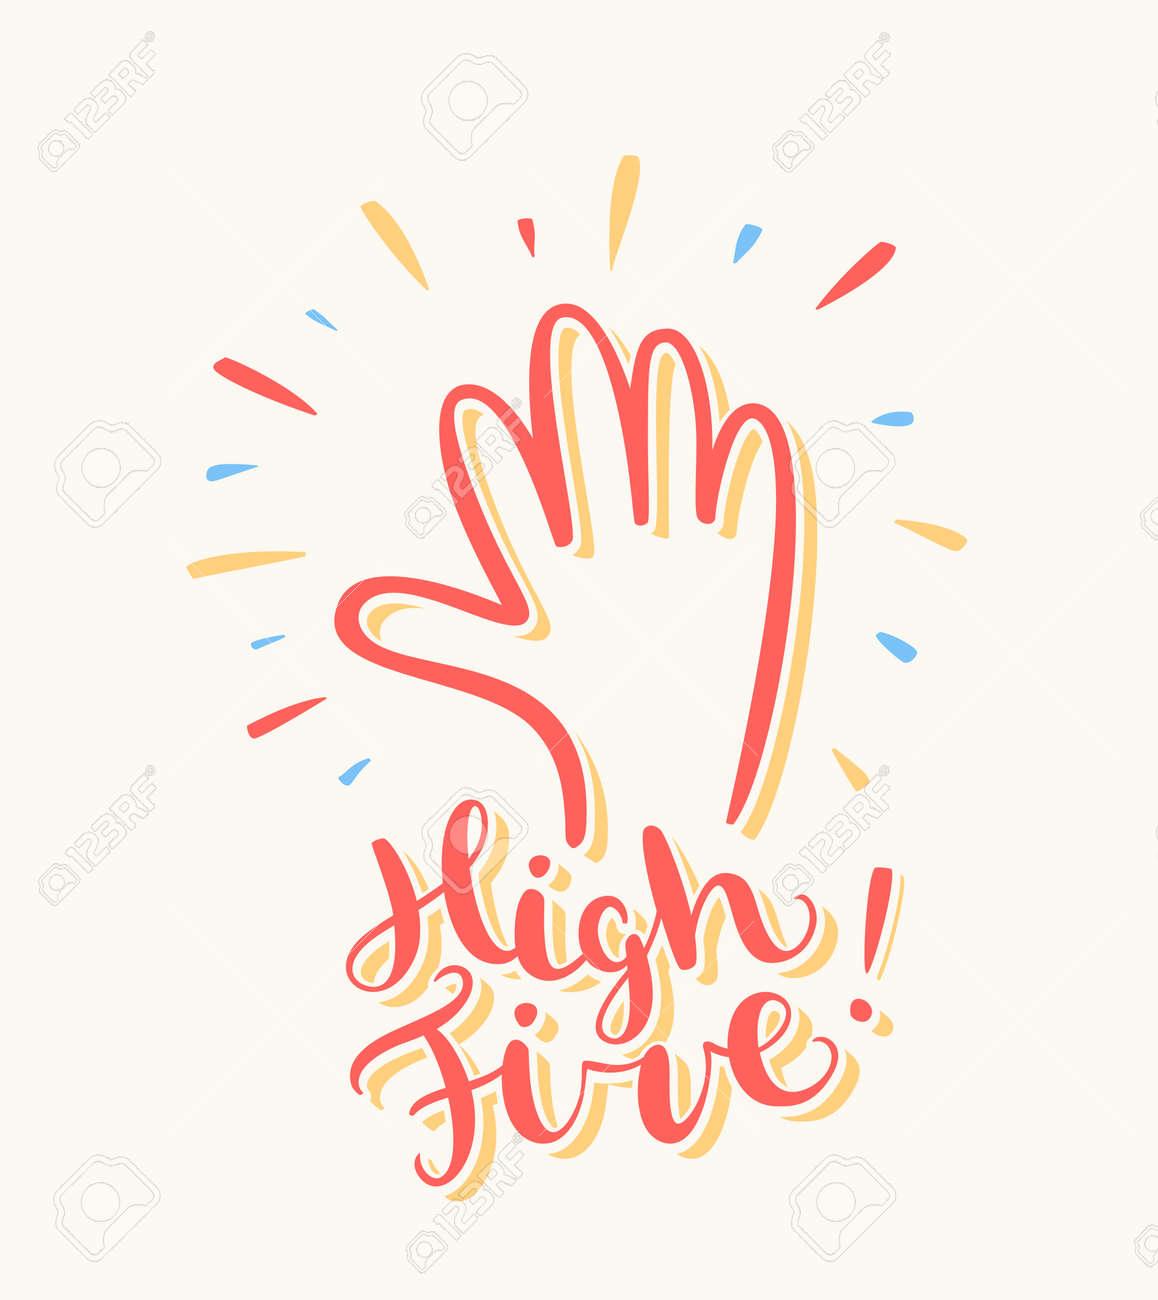 High five. Greeting card. - 51374095